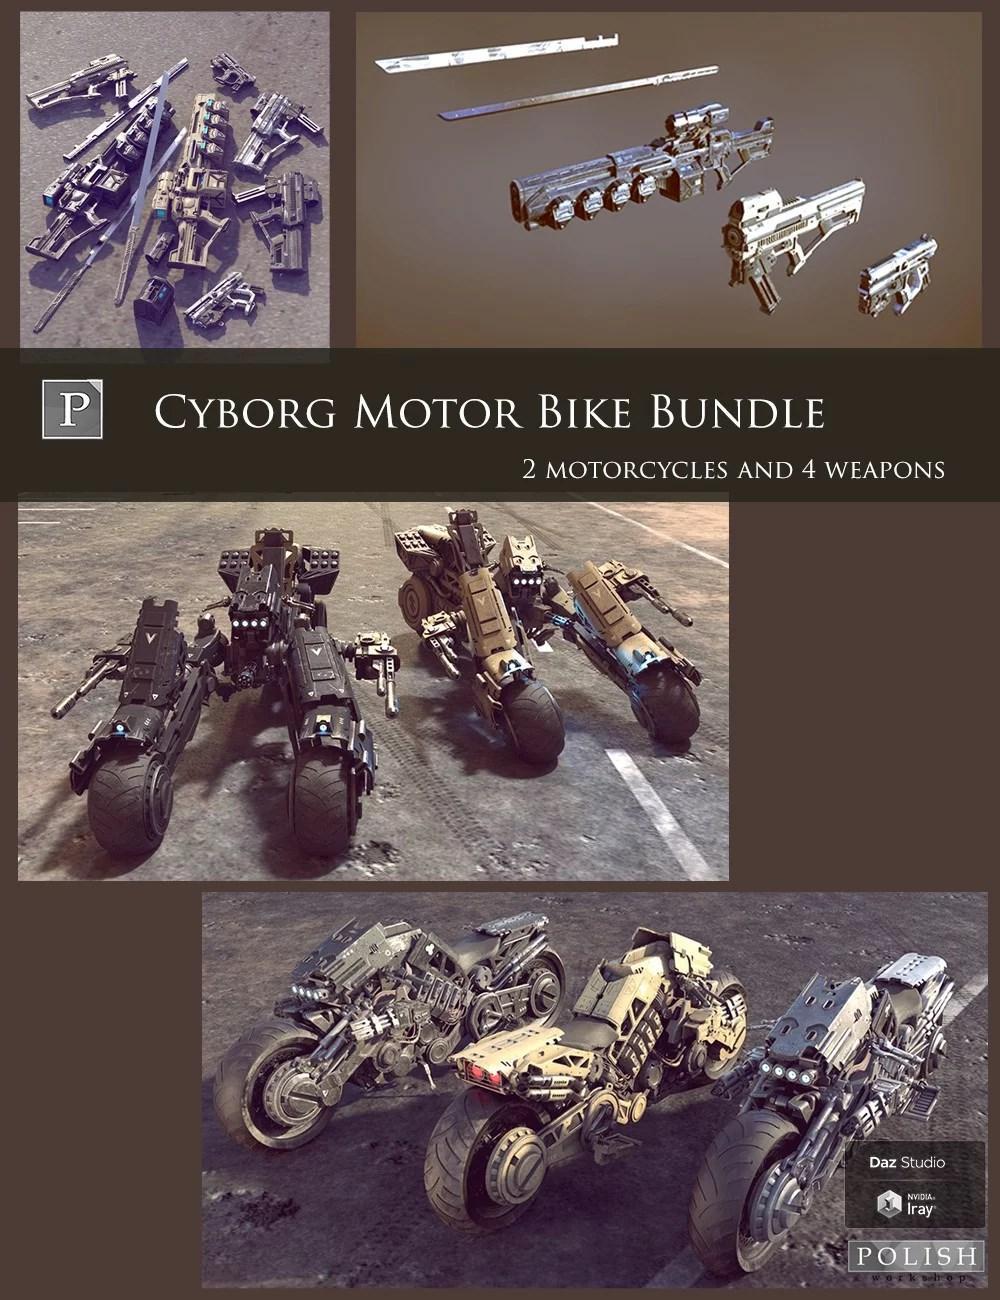 Cyborg Motor Bike Bundle